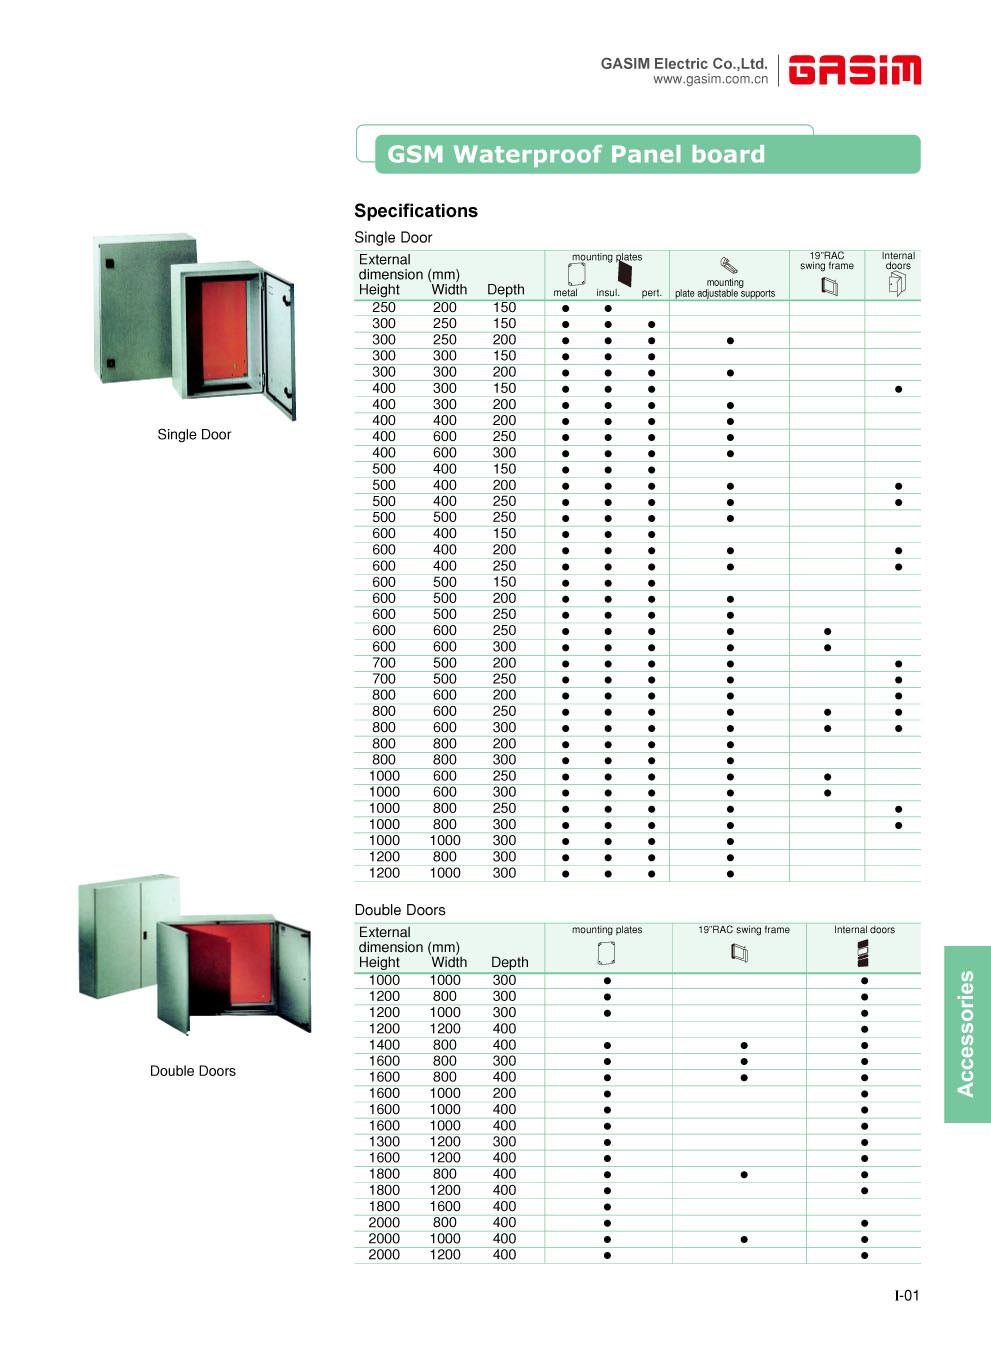 Stainless steel besi gsm tahan air panel papan distribusi listrik stainless steel besi gsm tahan air panel papan distribusi listrik tunggalganda pintu ccuart Image collections